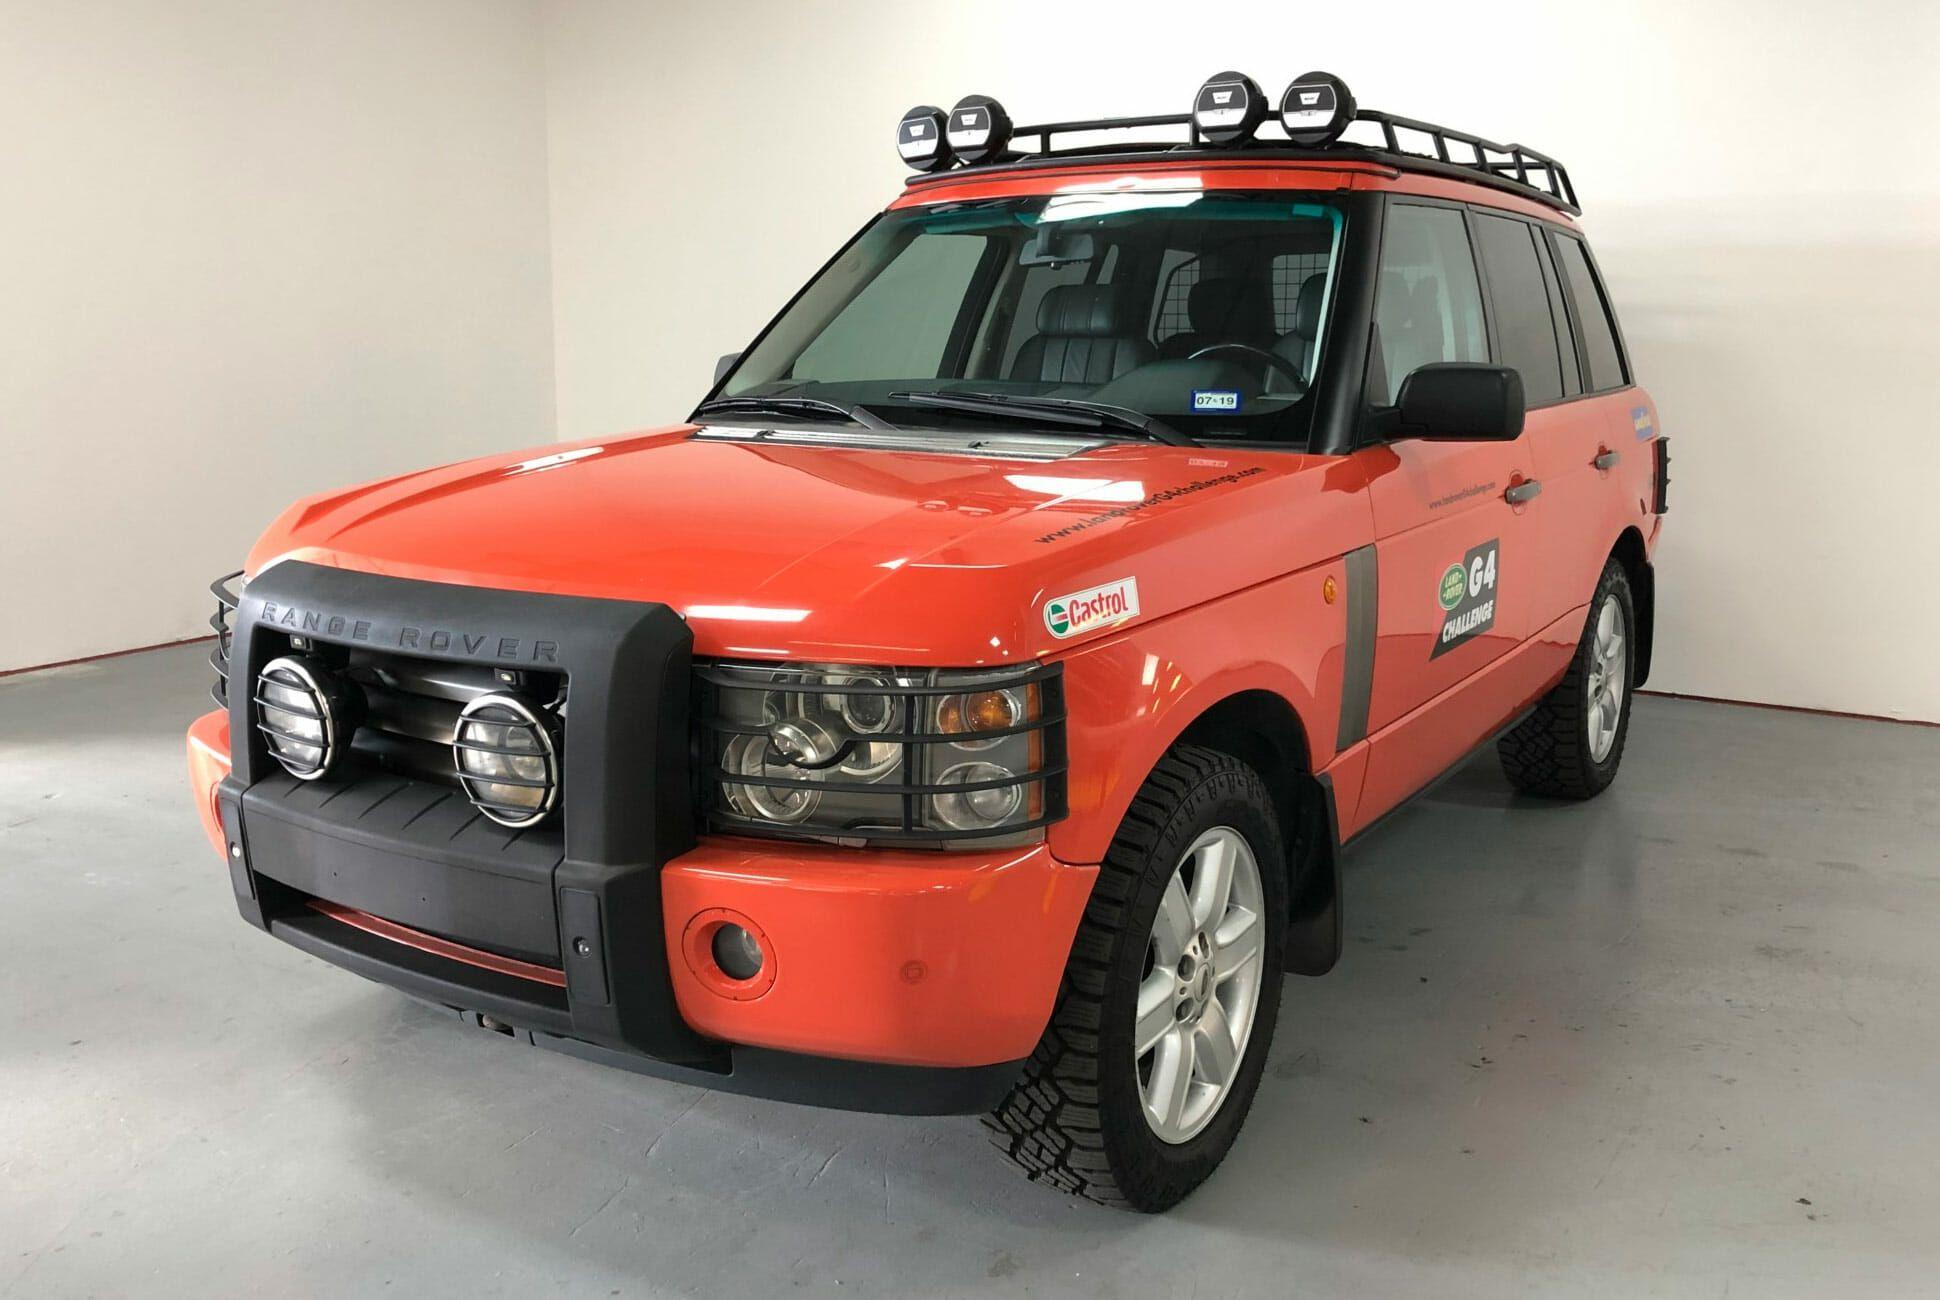 2003-Land-Rover-Range-Rover-G4-gear-patrol-slide-2